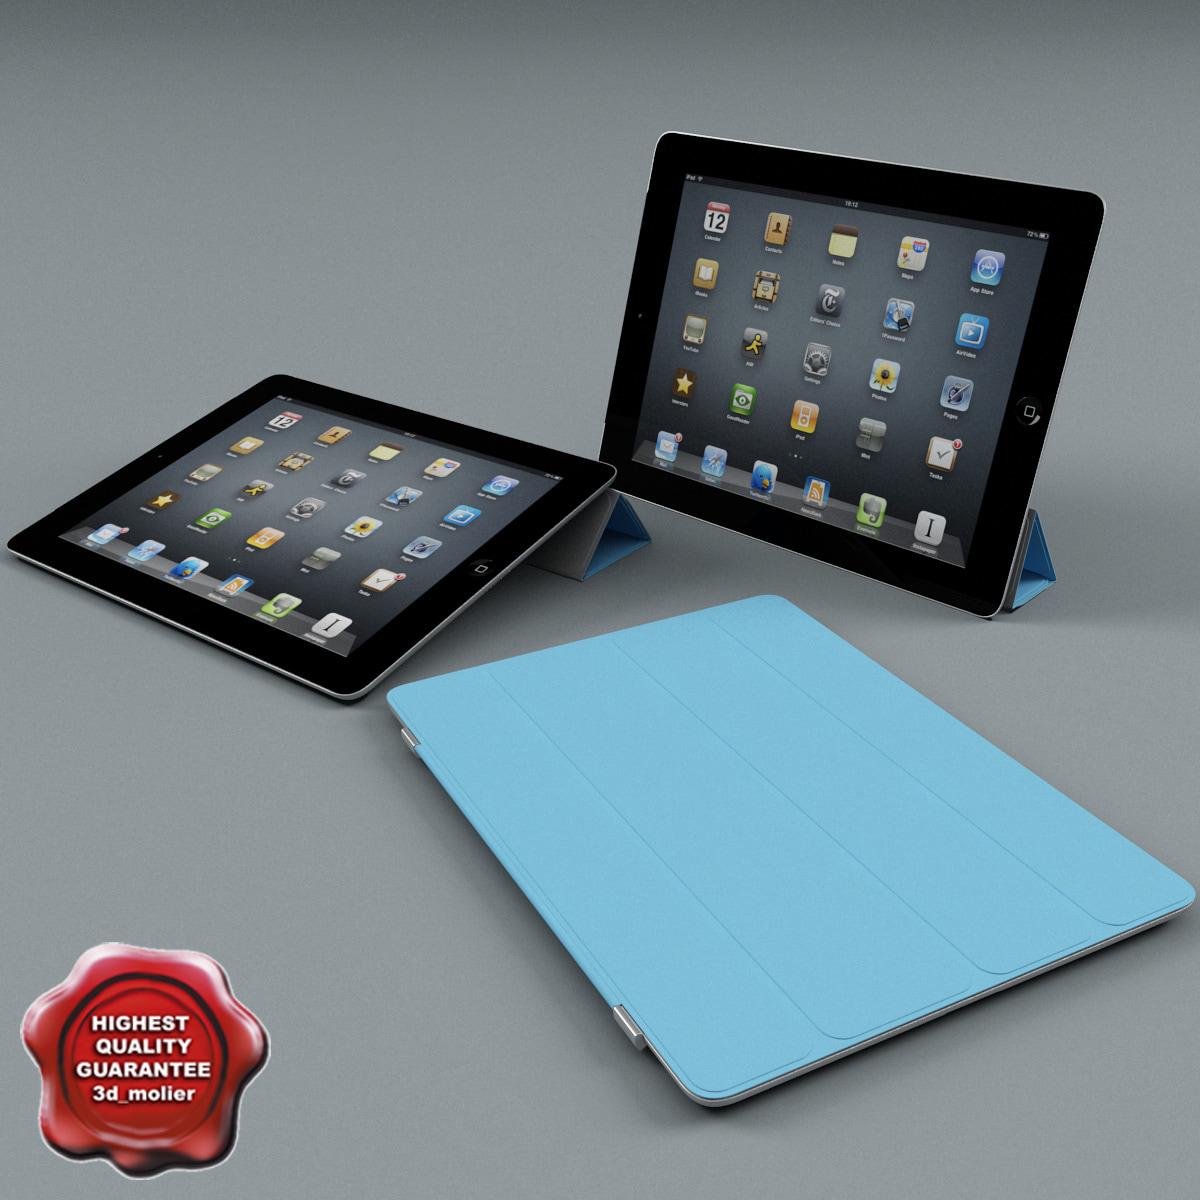 Apple_ipad2_and_SmartCover_00.jpg